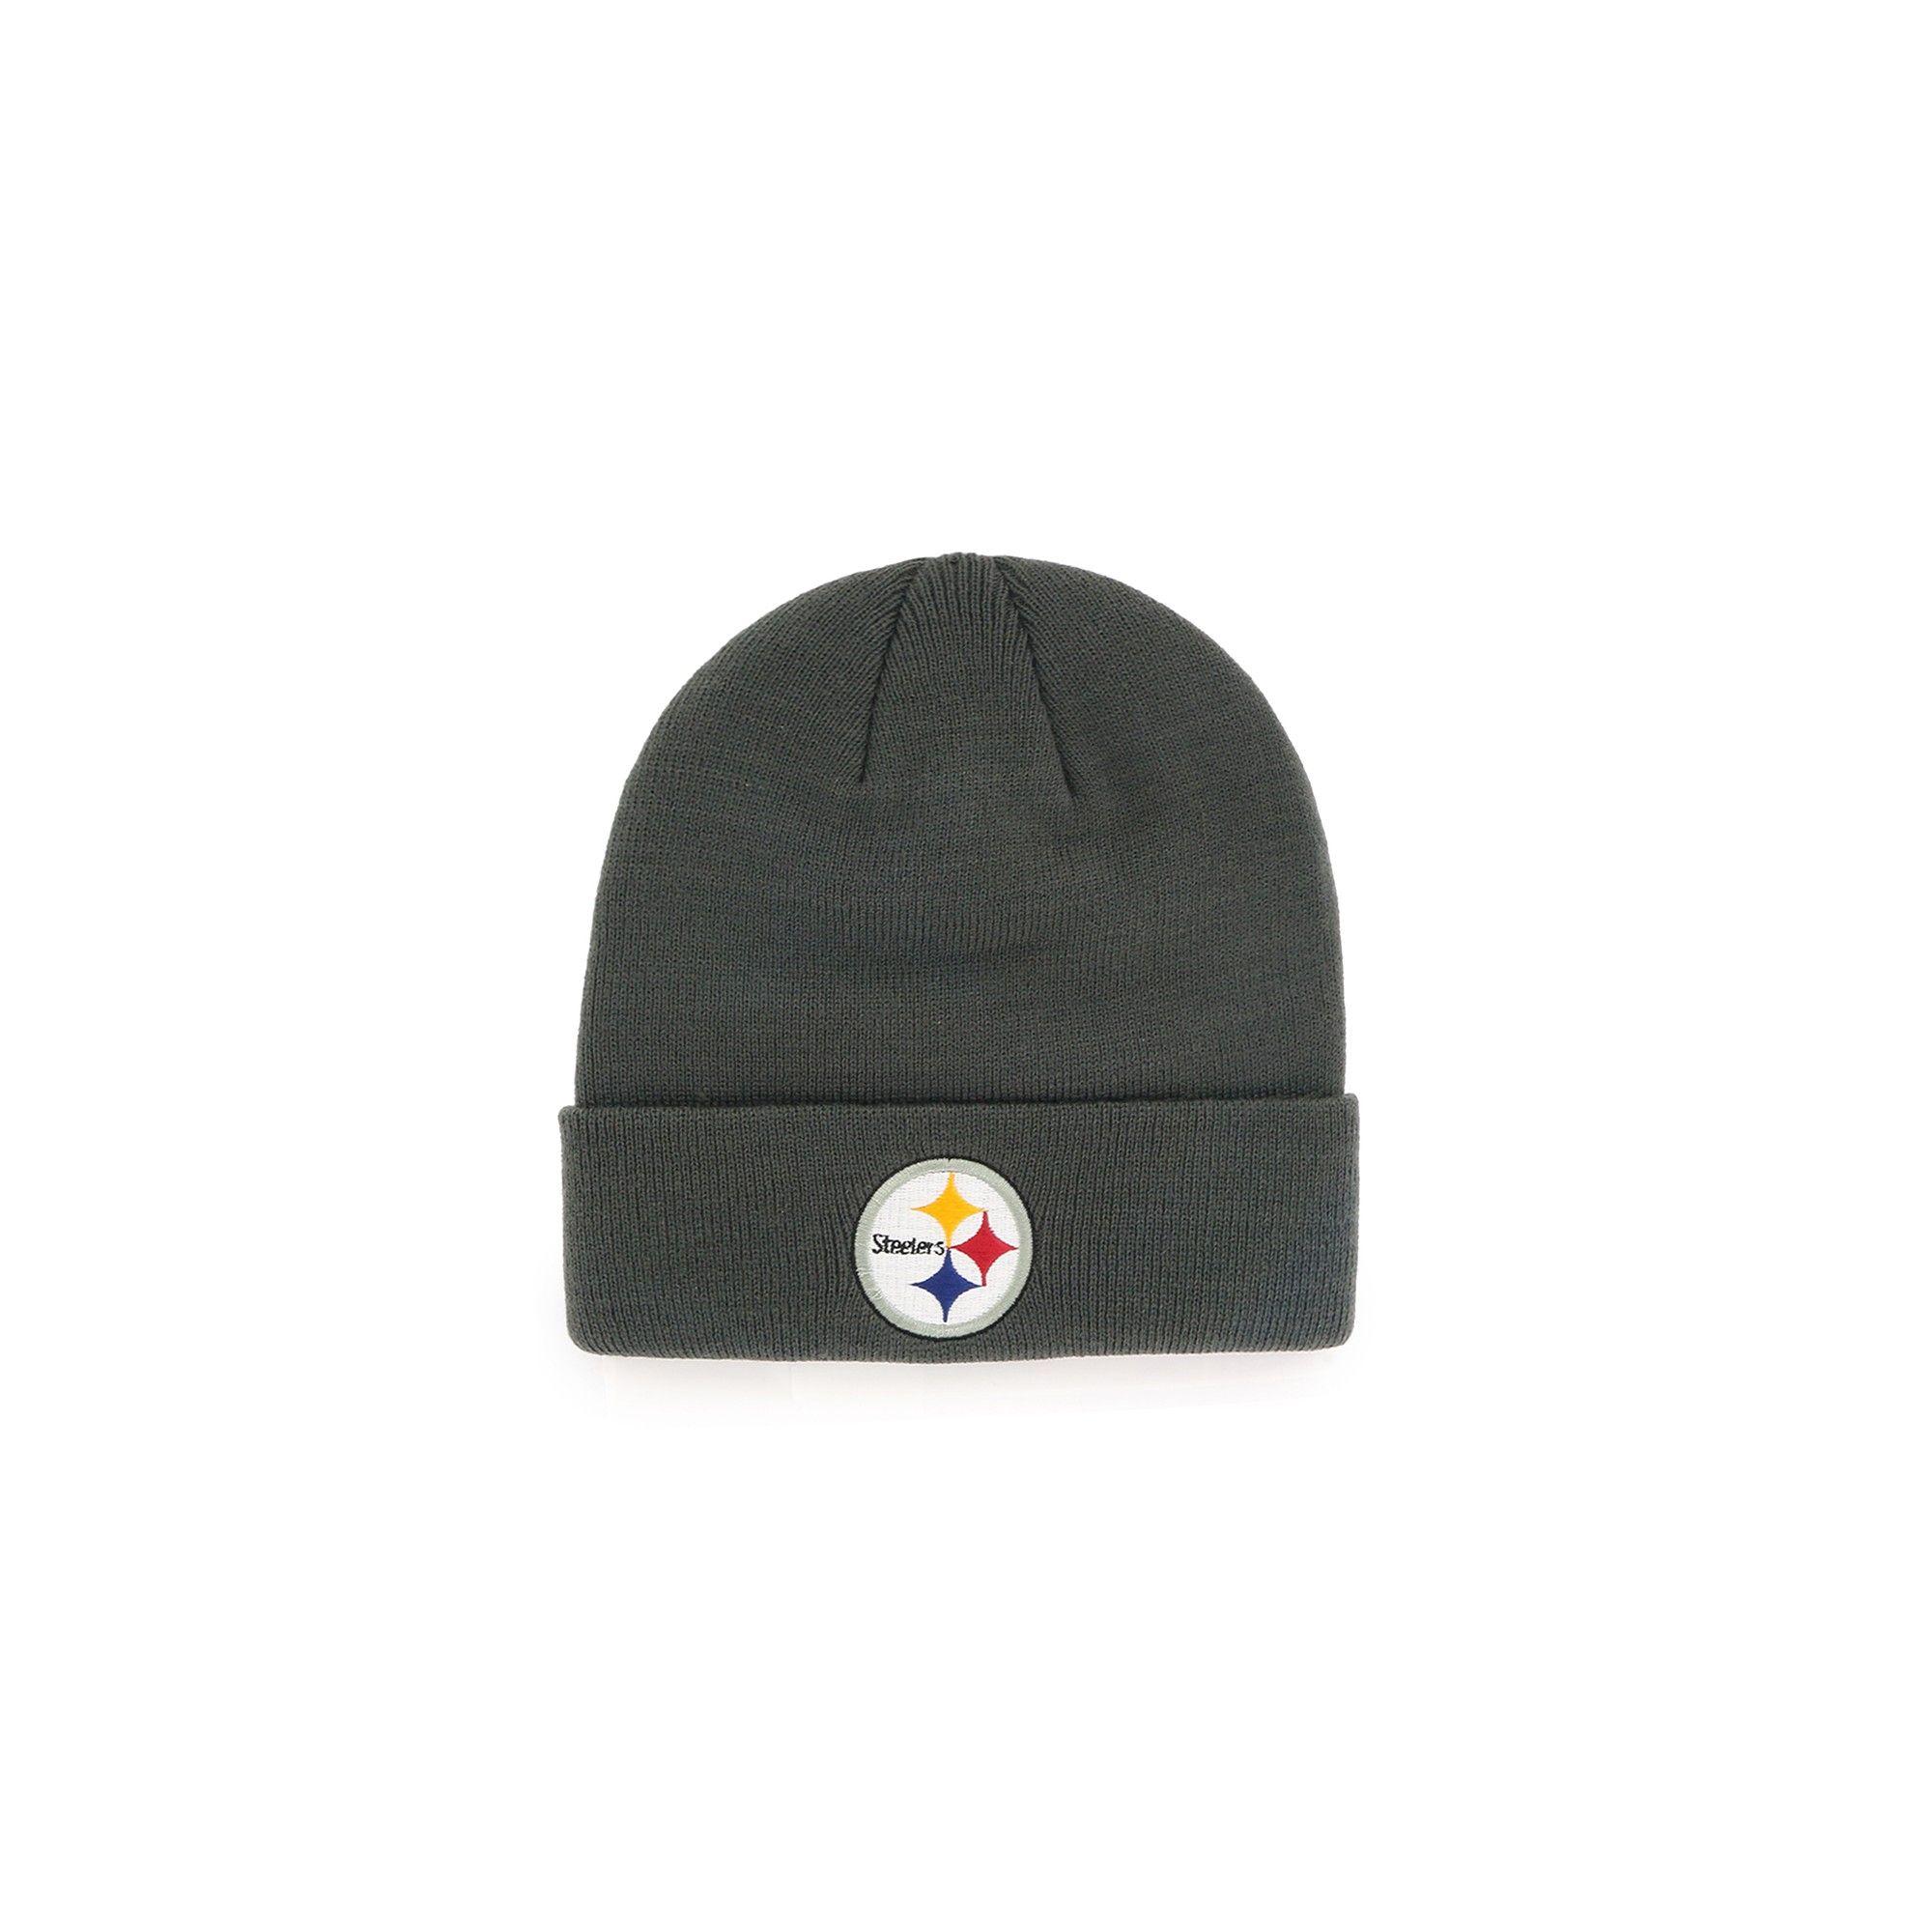 NFL Pittsburgh Steelers Cuff Knit Beanie by Fan Favorite bf2a2d642